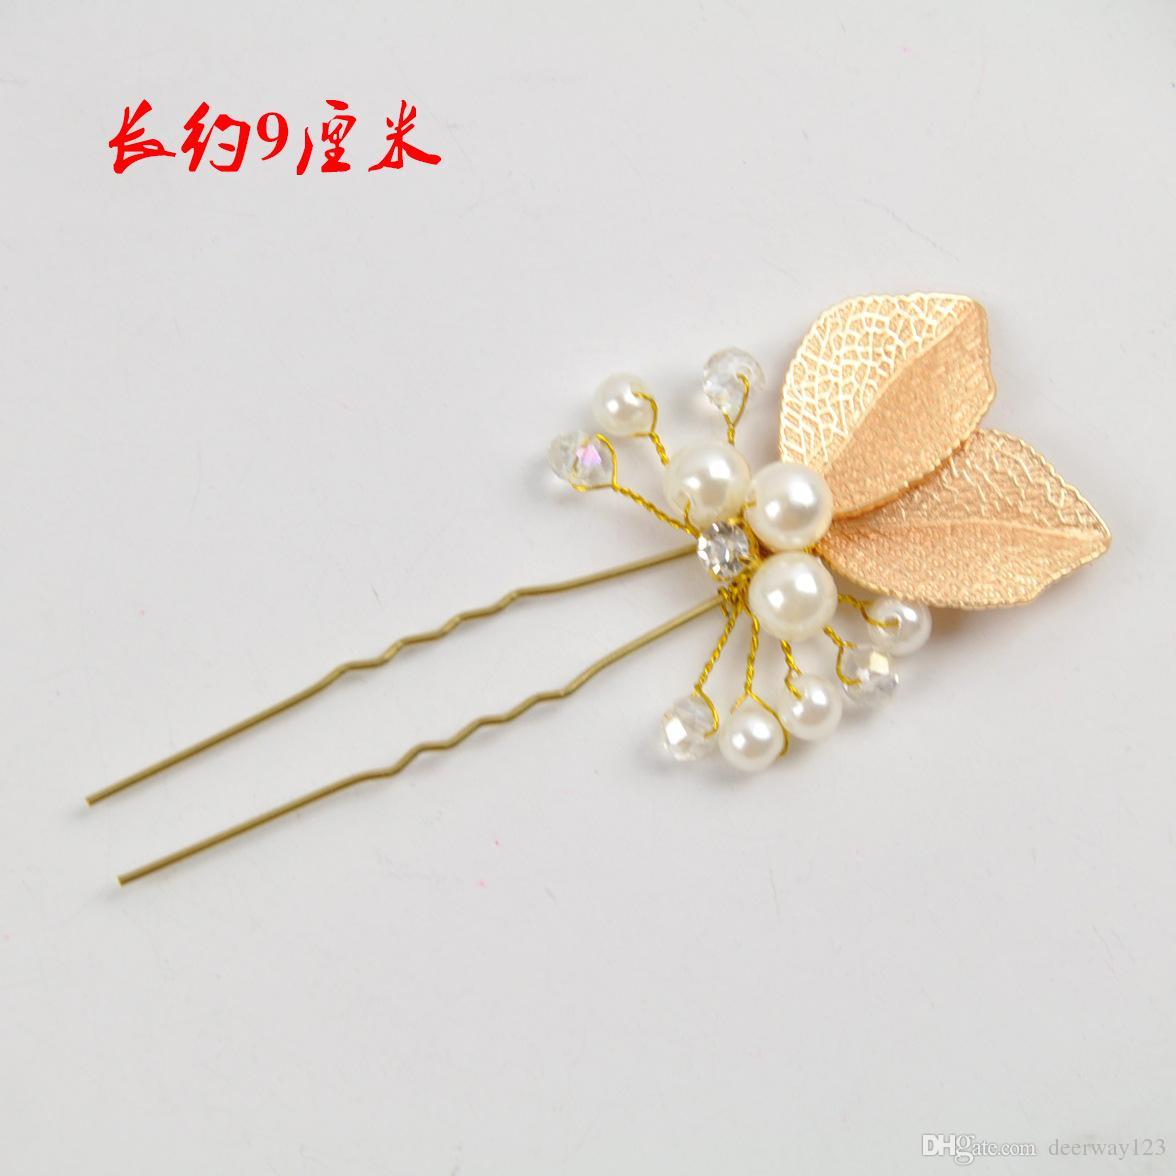 Wedding Accessories Golden Bridal Pearl Hairpins Flower Crystal Rhinestone Hair Pins Clips Bridesmaid Women Hair Jewelry clip&pin